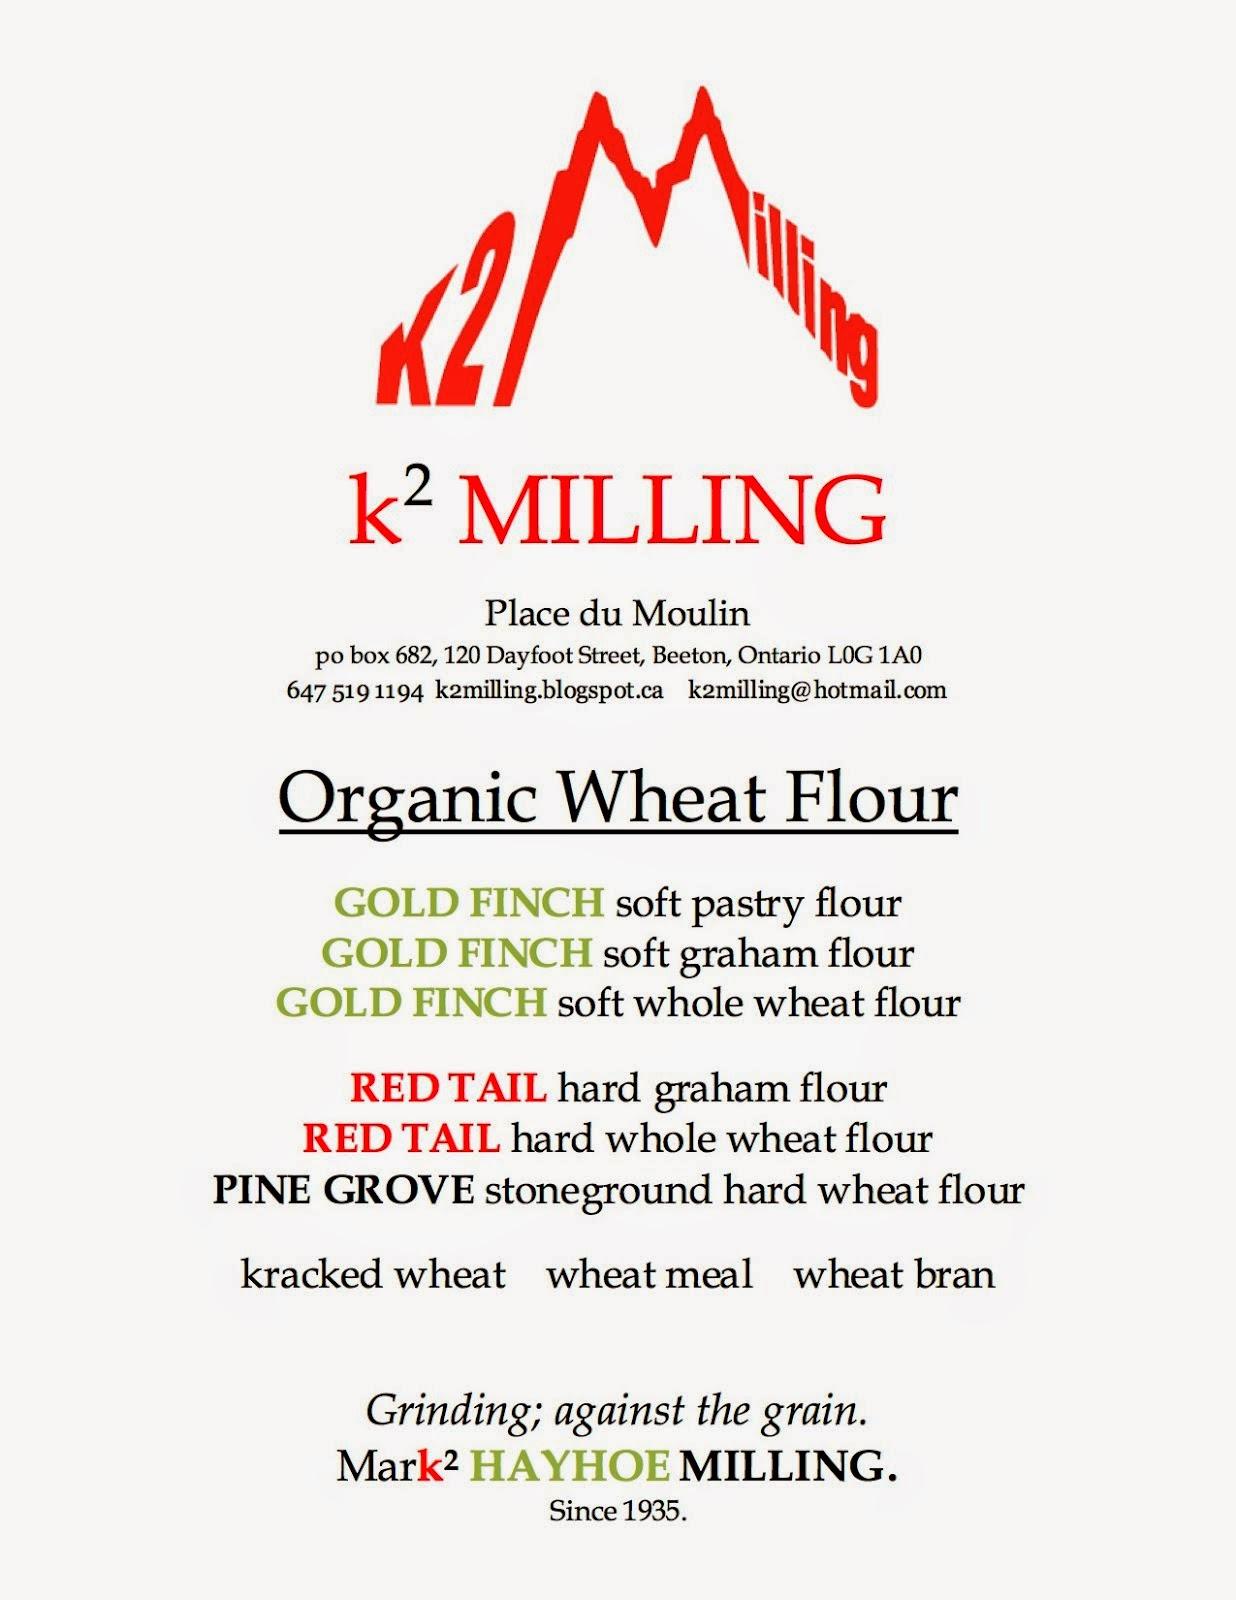 Organik Wheat Flour